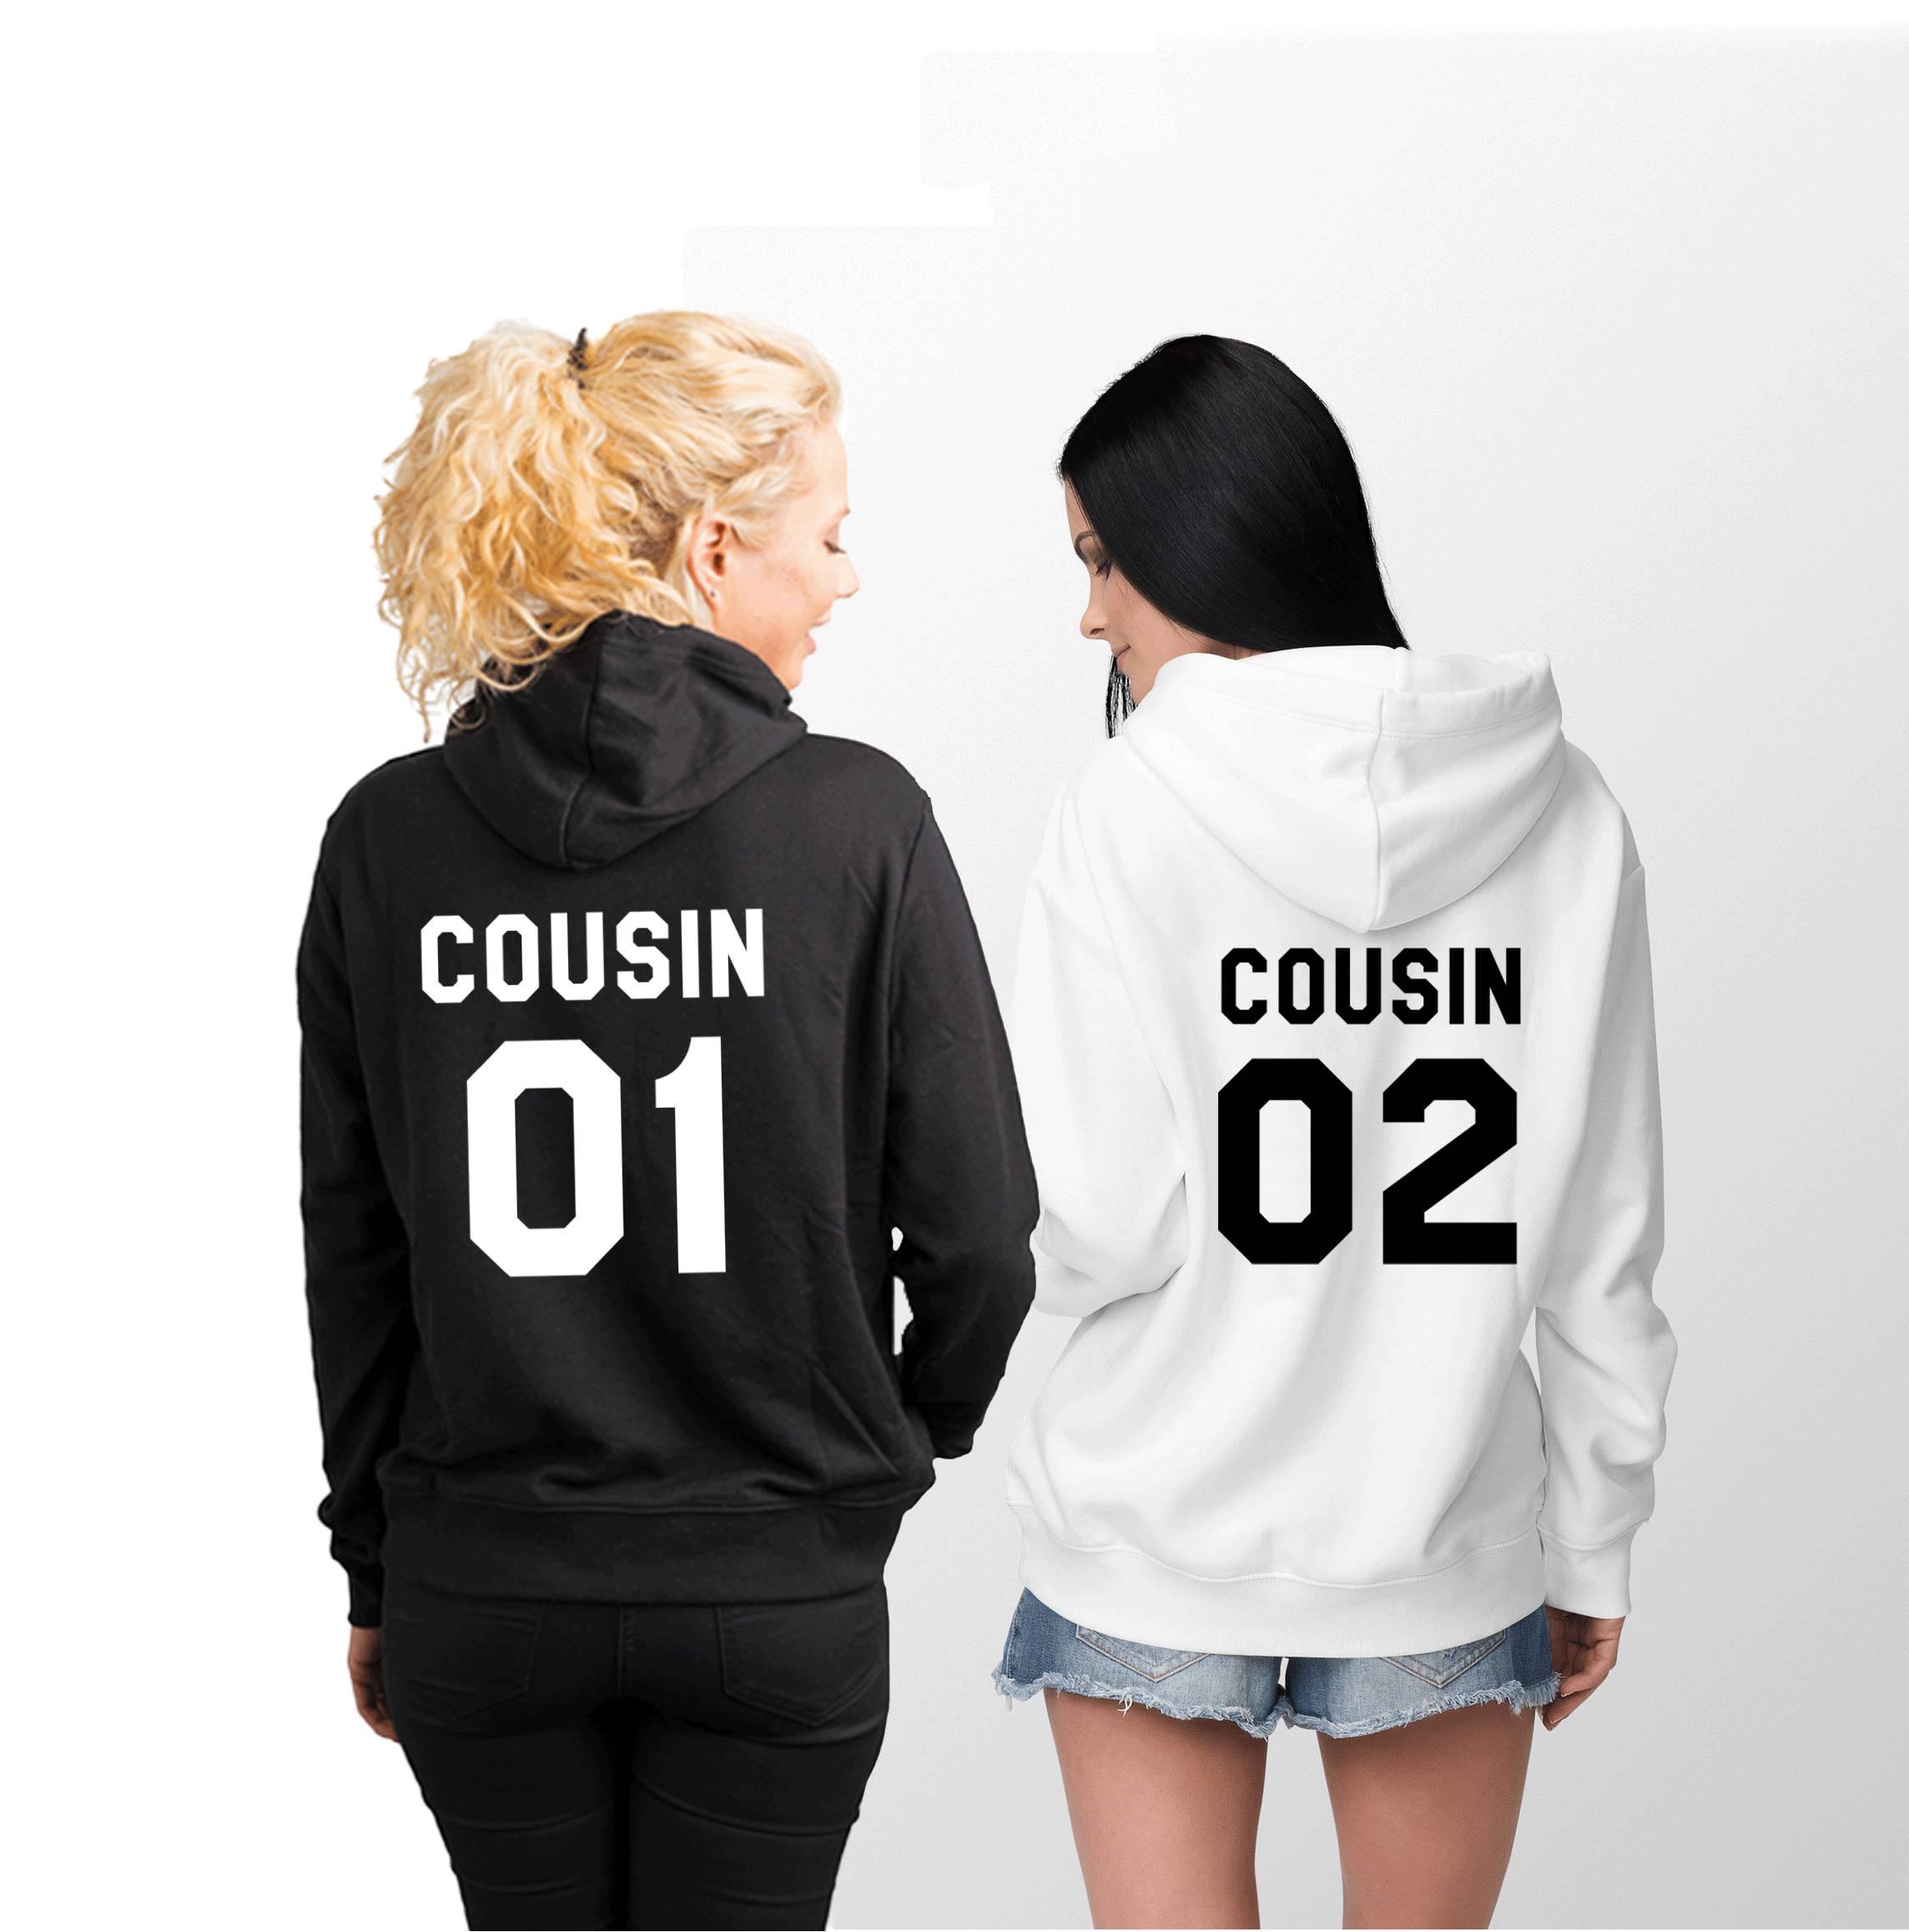 Cousin 01 Cousin 02 Hoodies passende Hoodies Familie